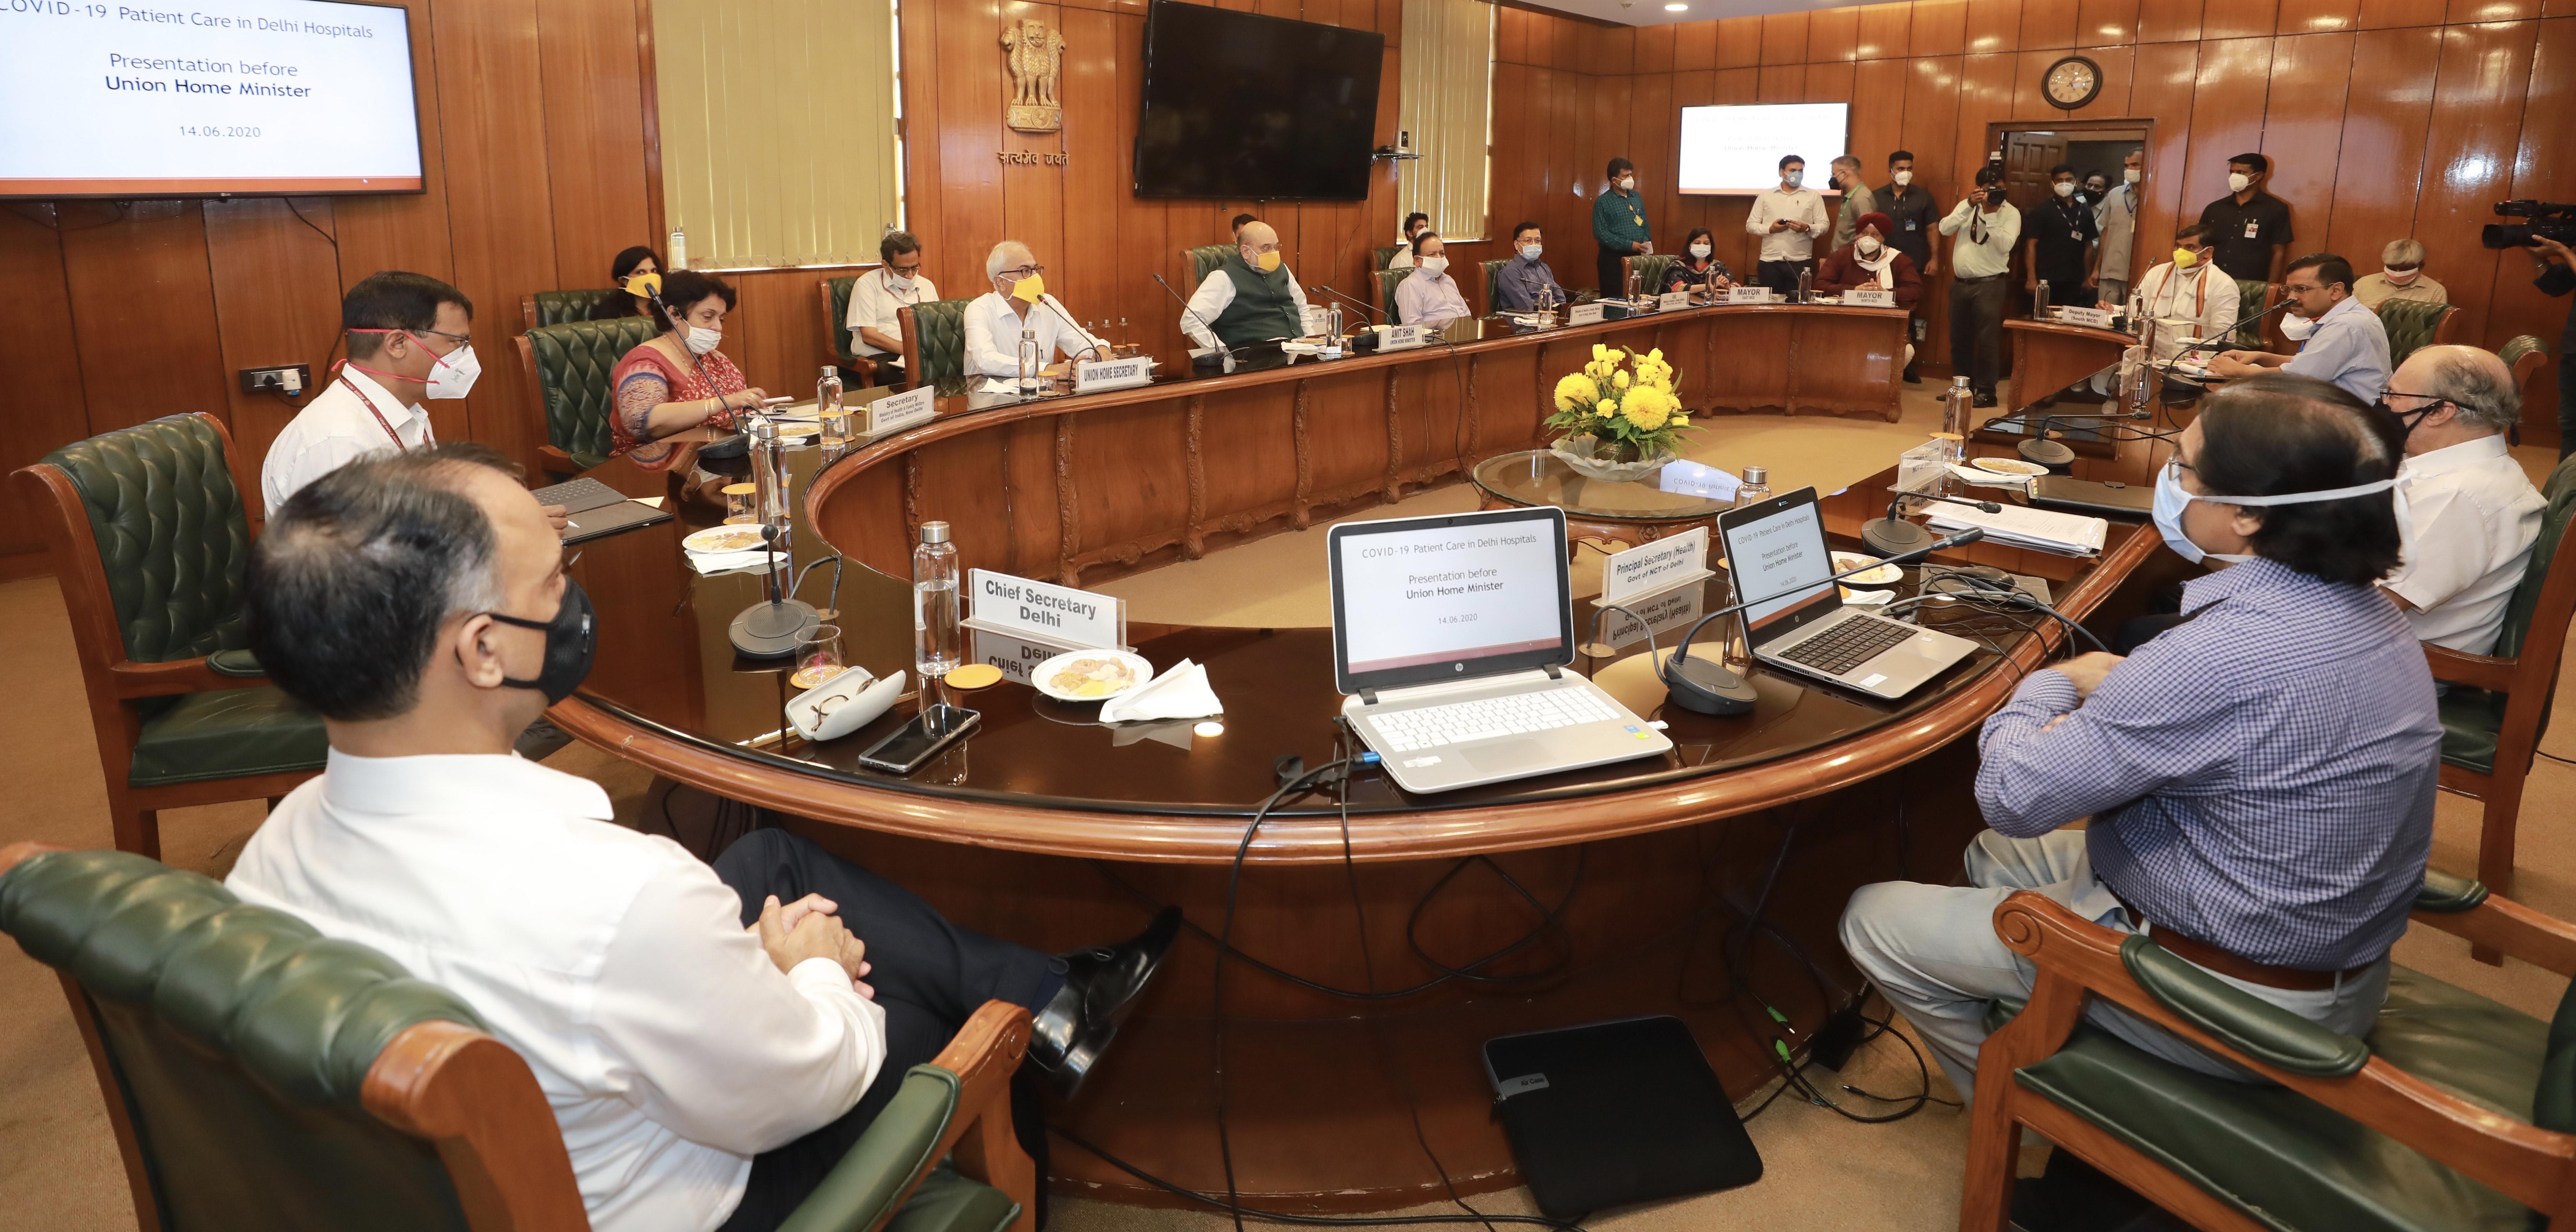 Union Home Minister Shri Amit Shah chairing a meeting